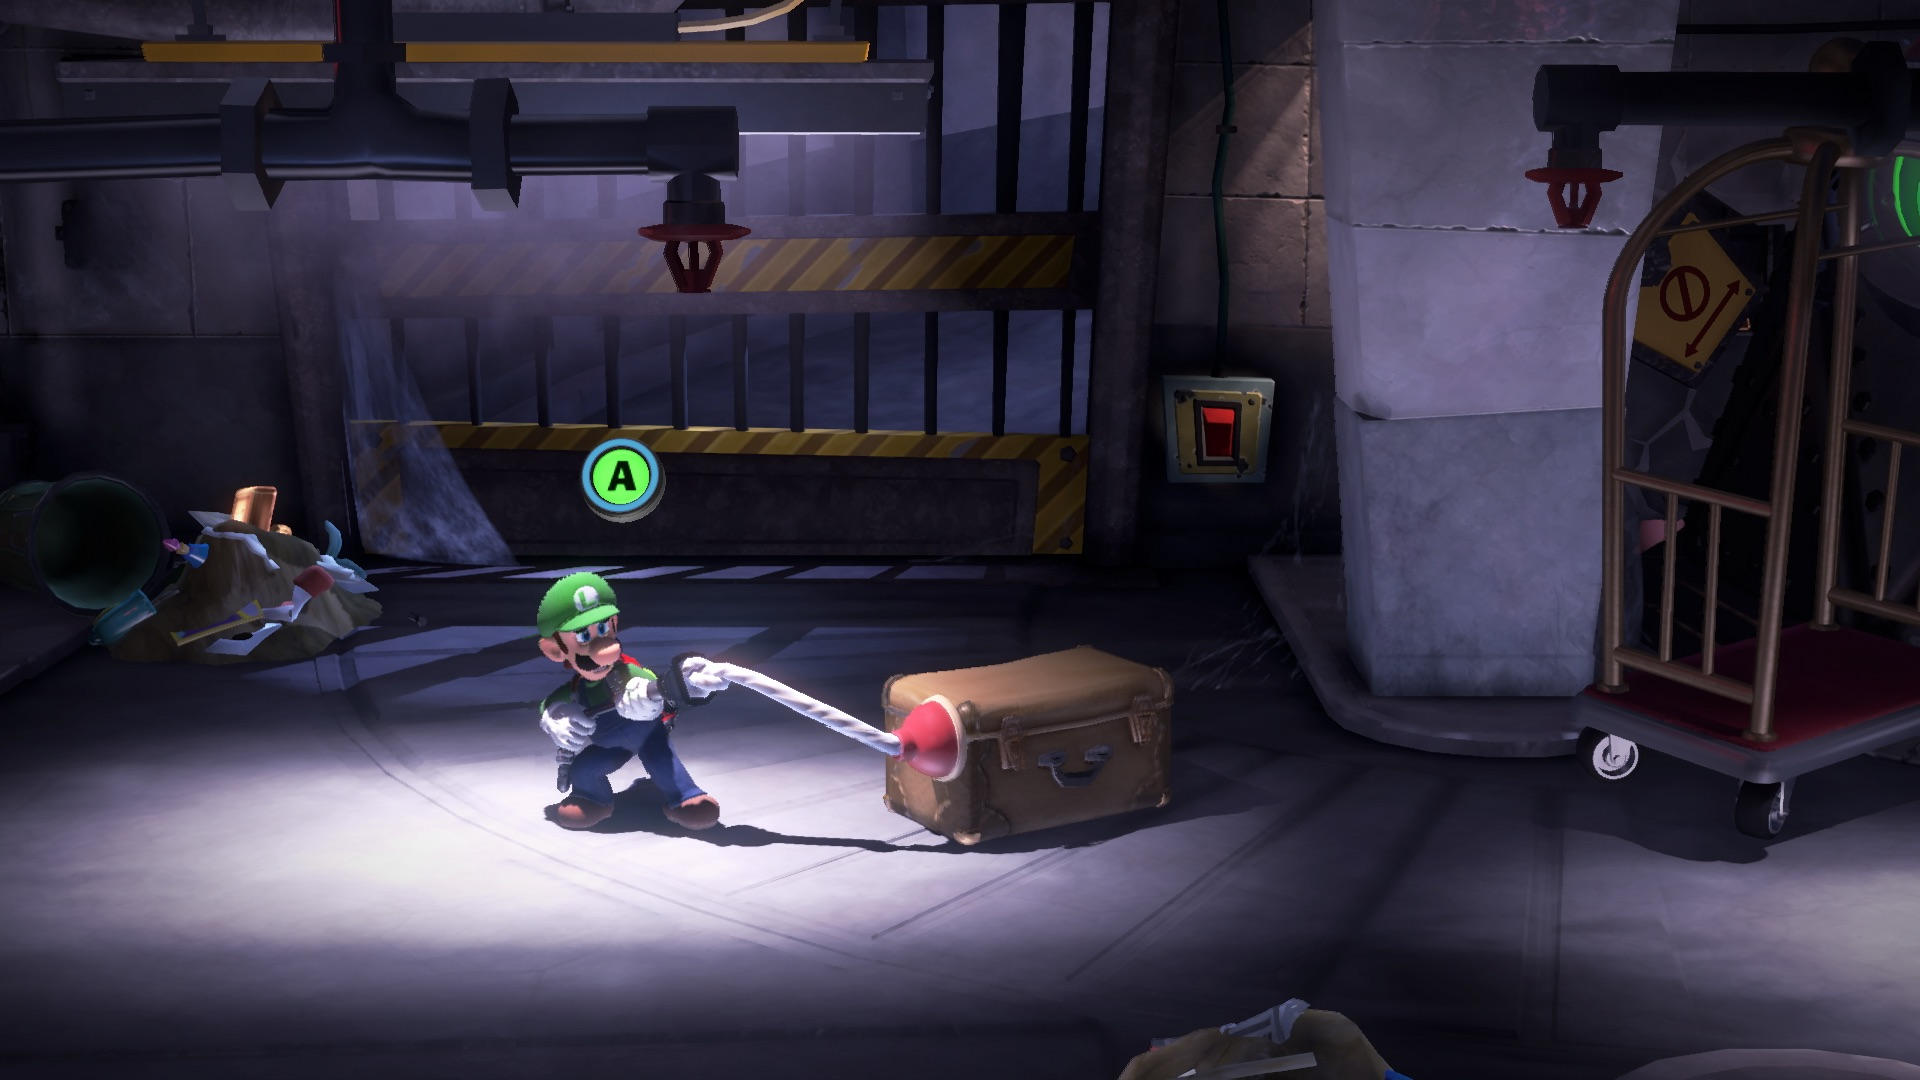 Luigi's Mansion 3 E3 2019 Screenshot 12